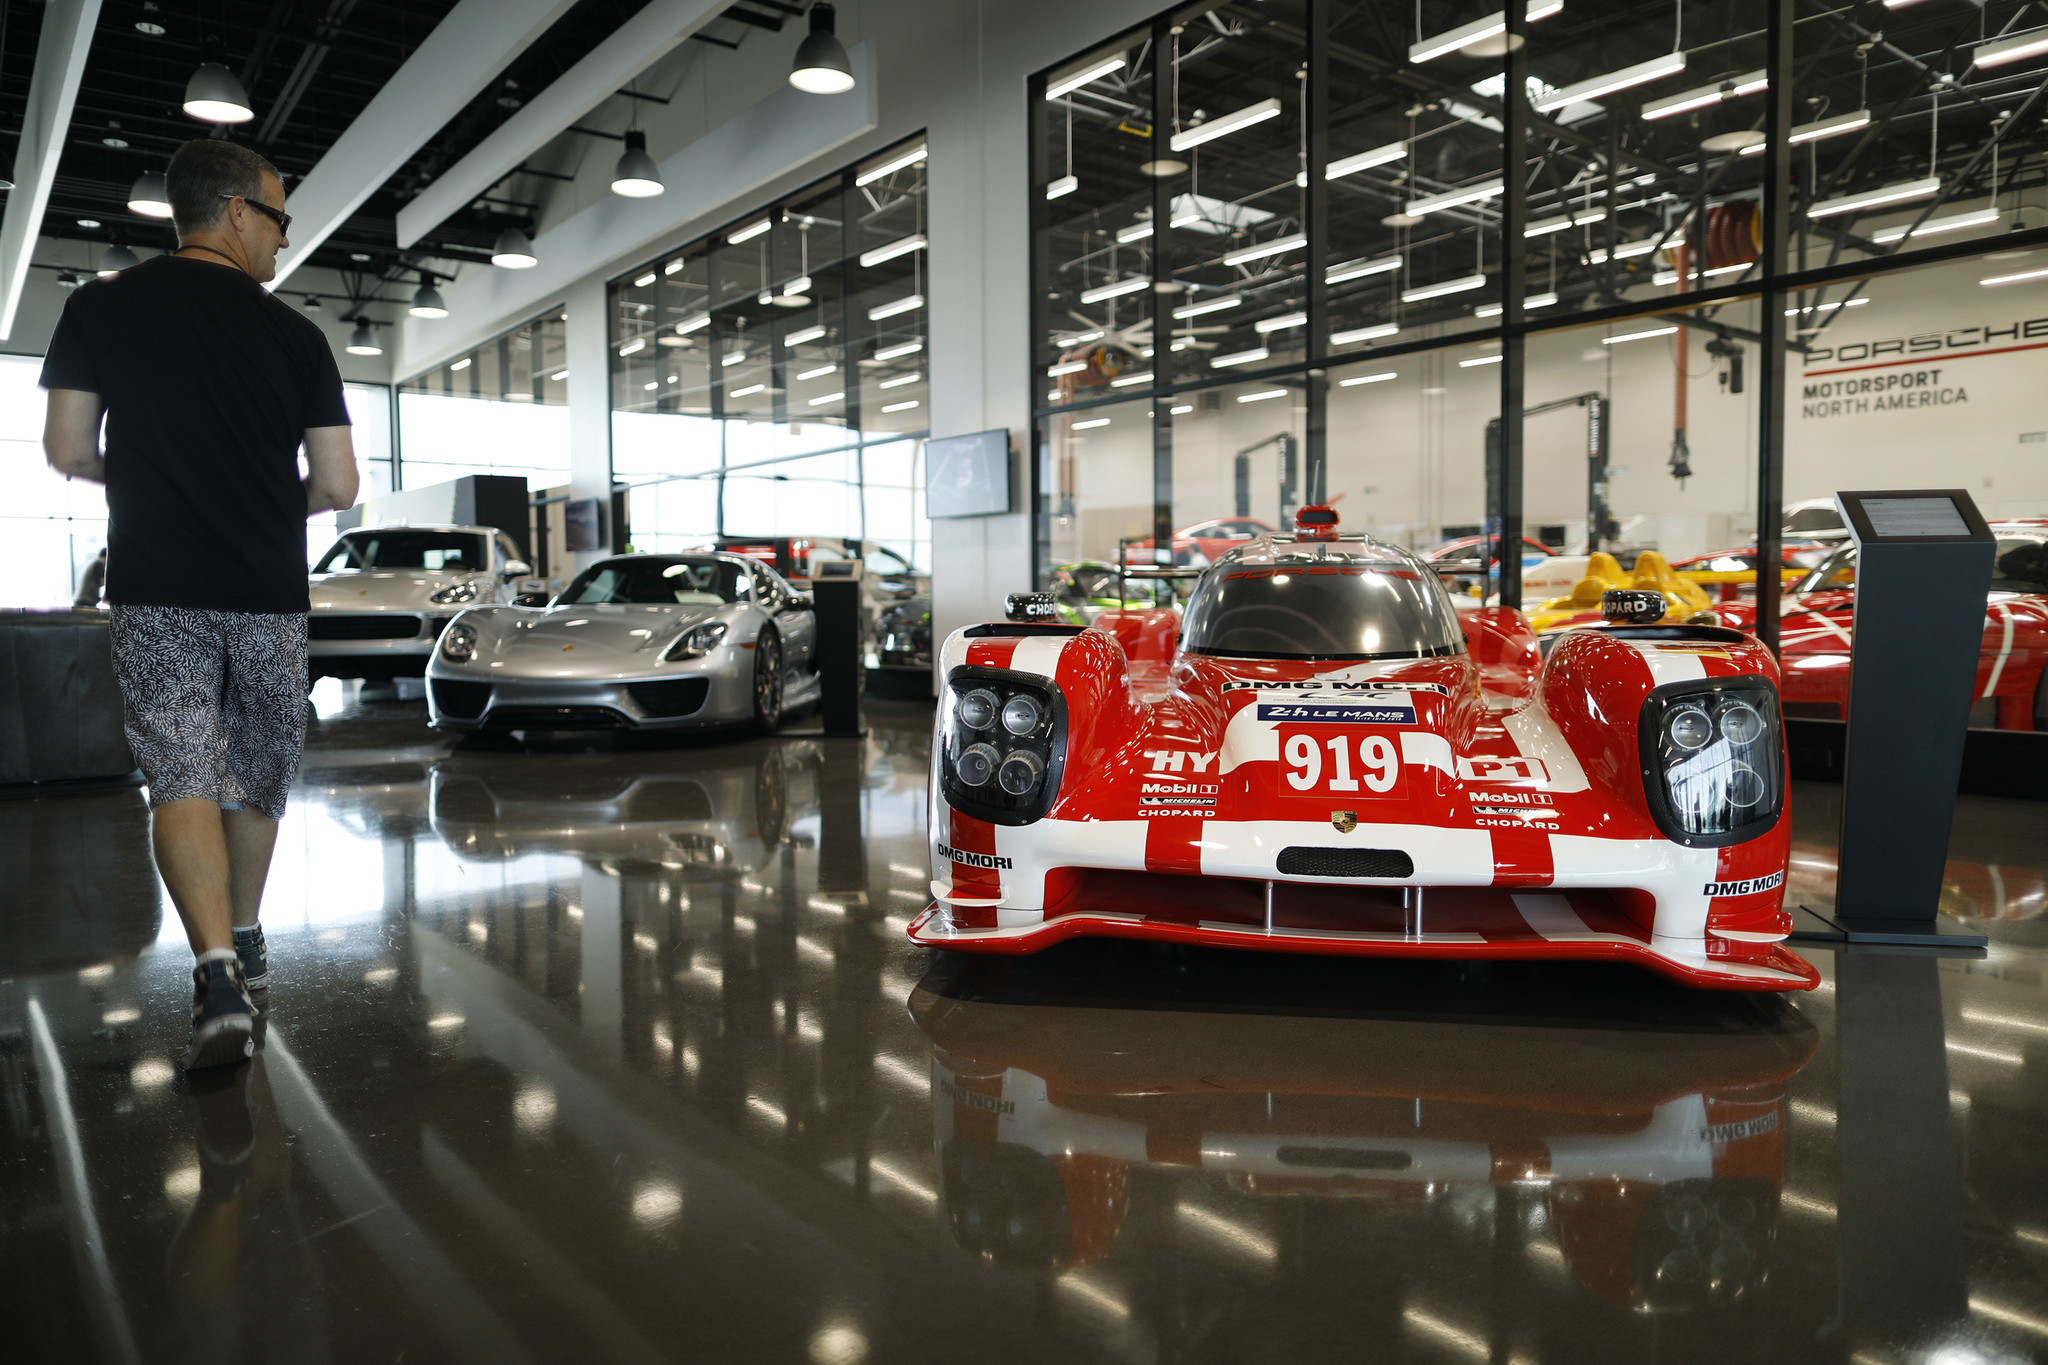 Porsche Experience Center >> Porsche S L A Experience Center Is A Theme Park For Grown Ups Who